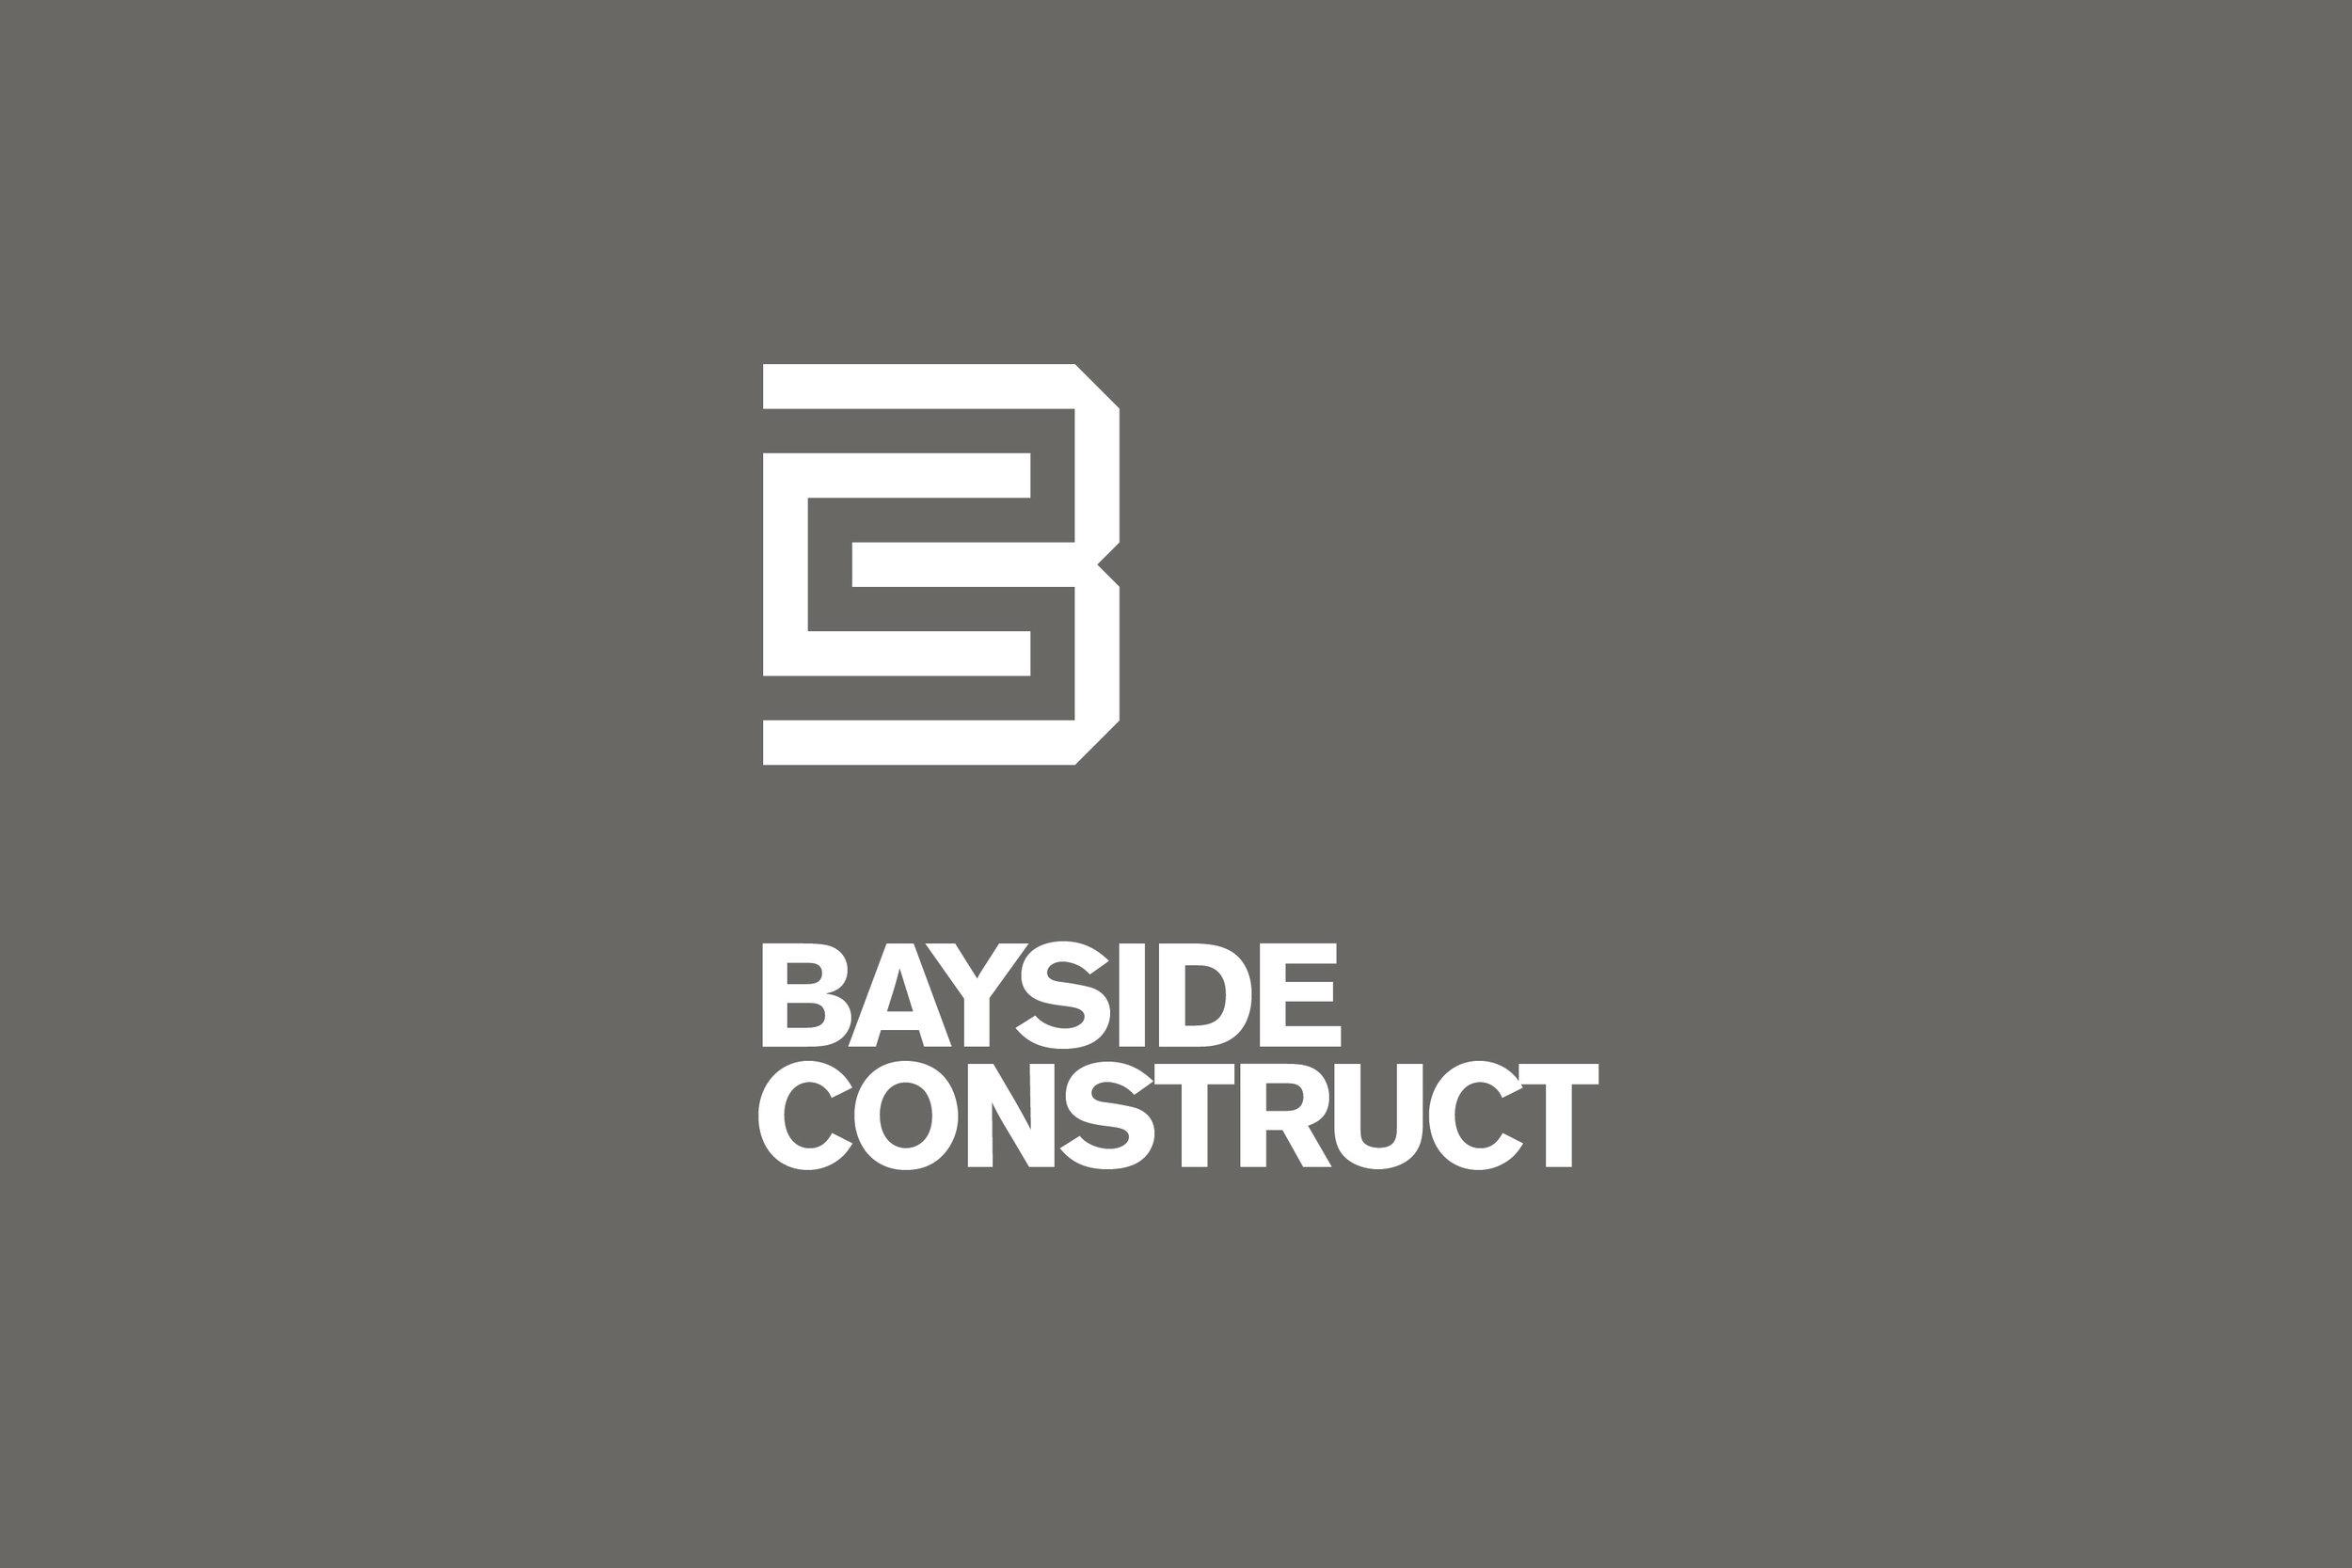 bayside Construct identity